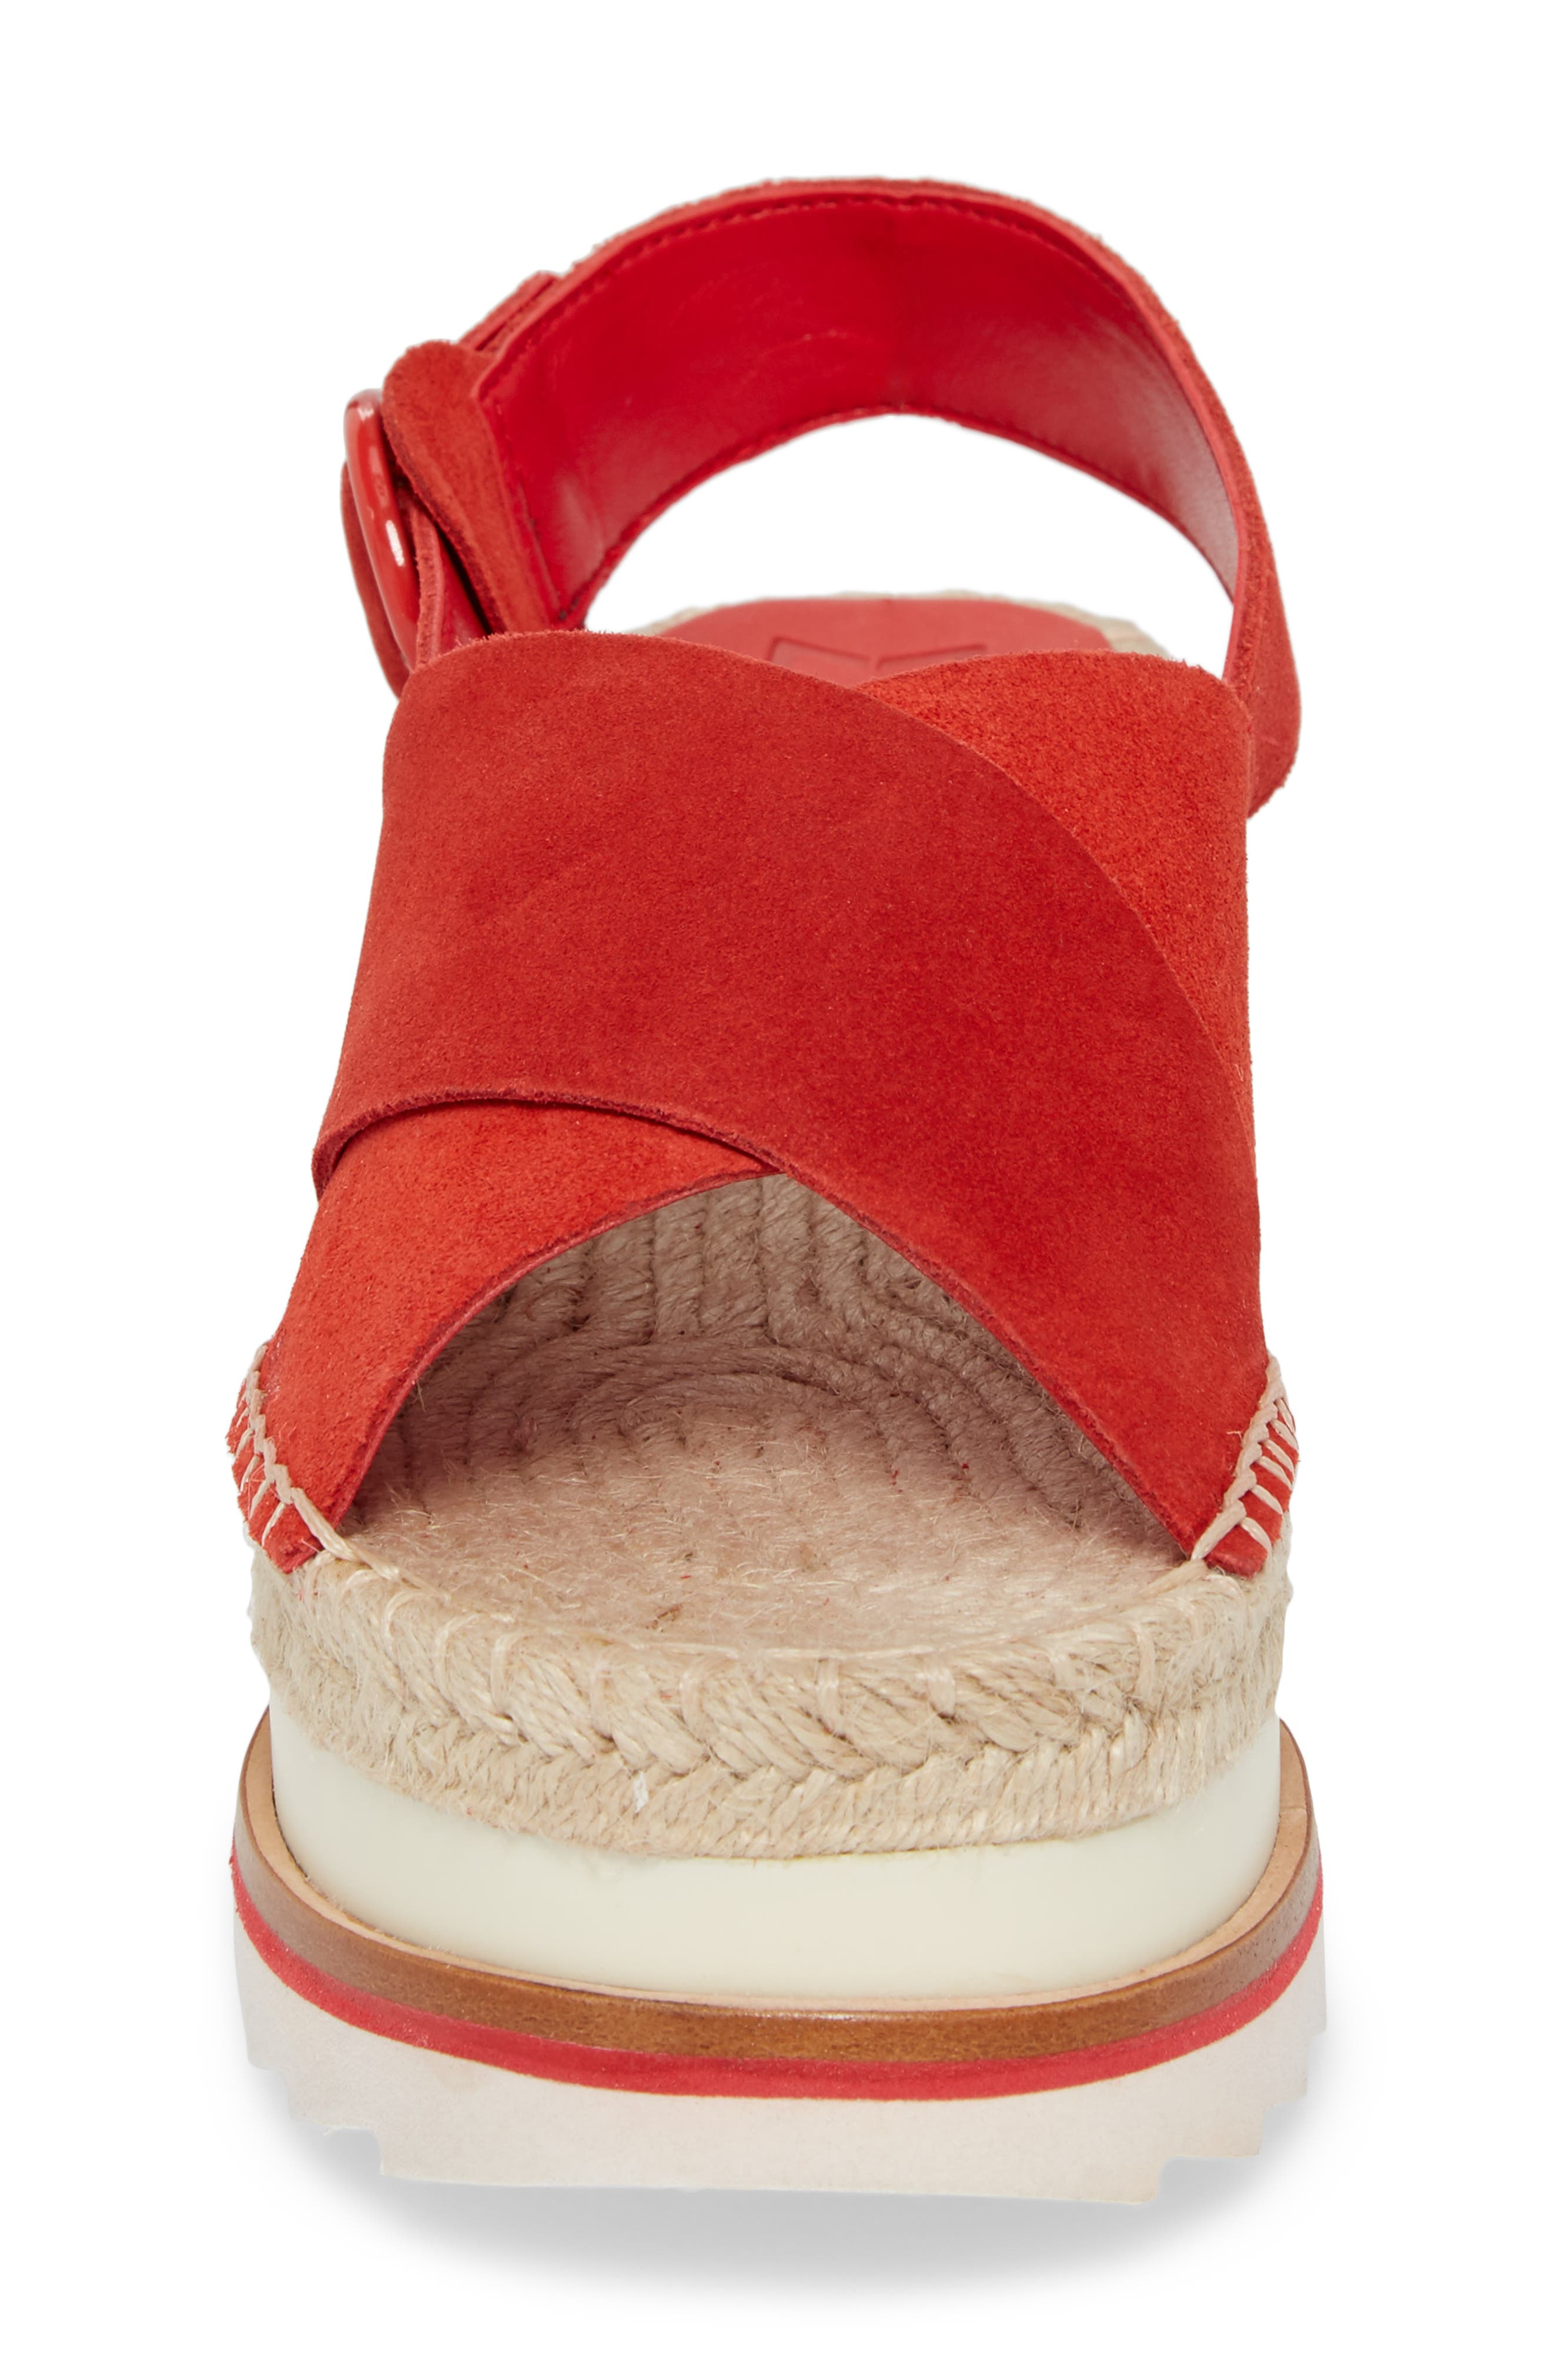 Glenna Platform Slingback Sandal,                             Alternate thumbnail 16, color,